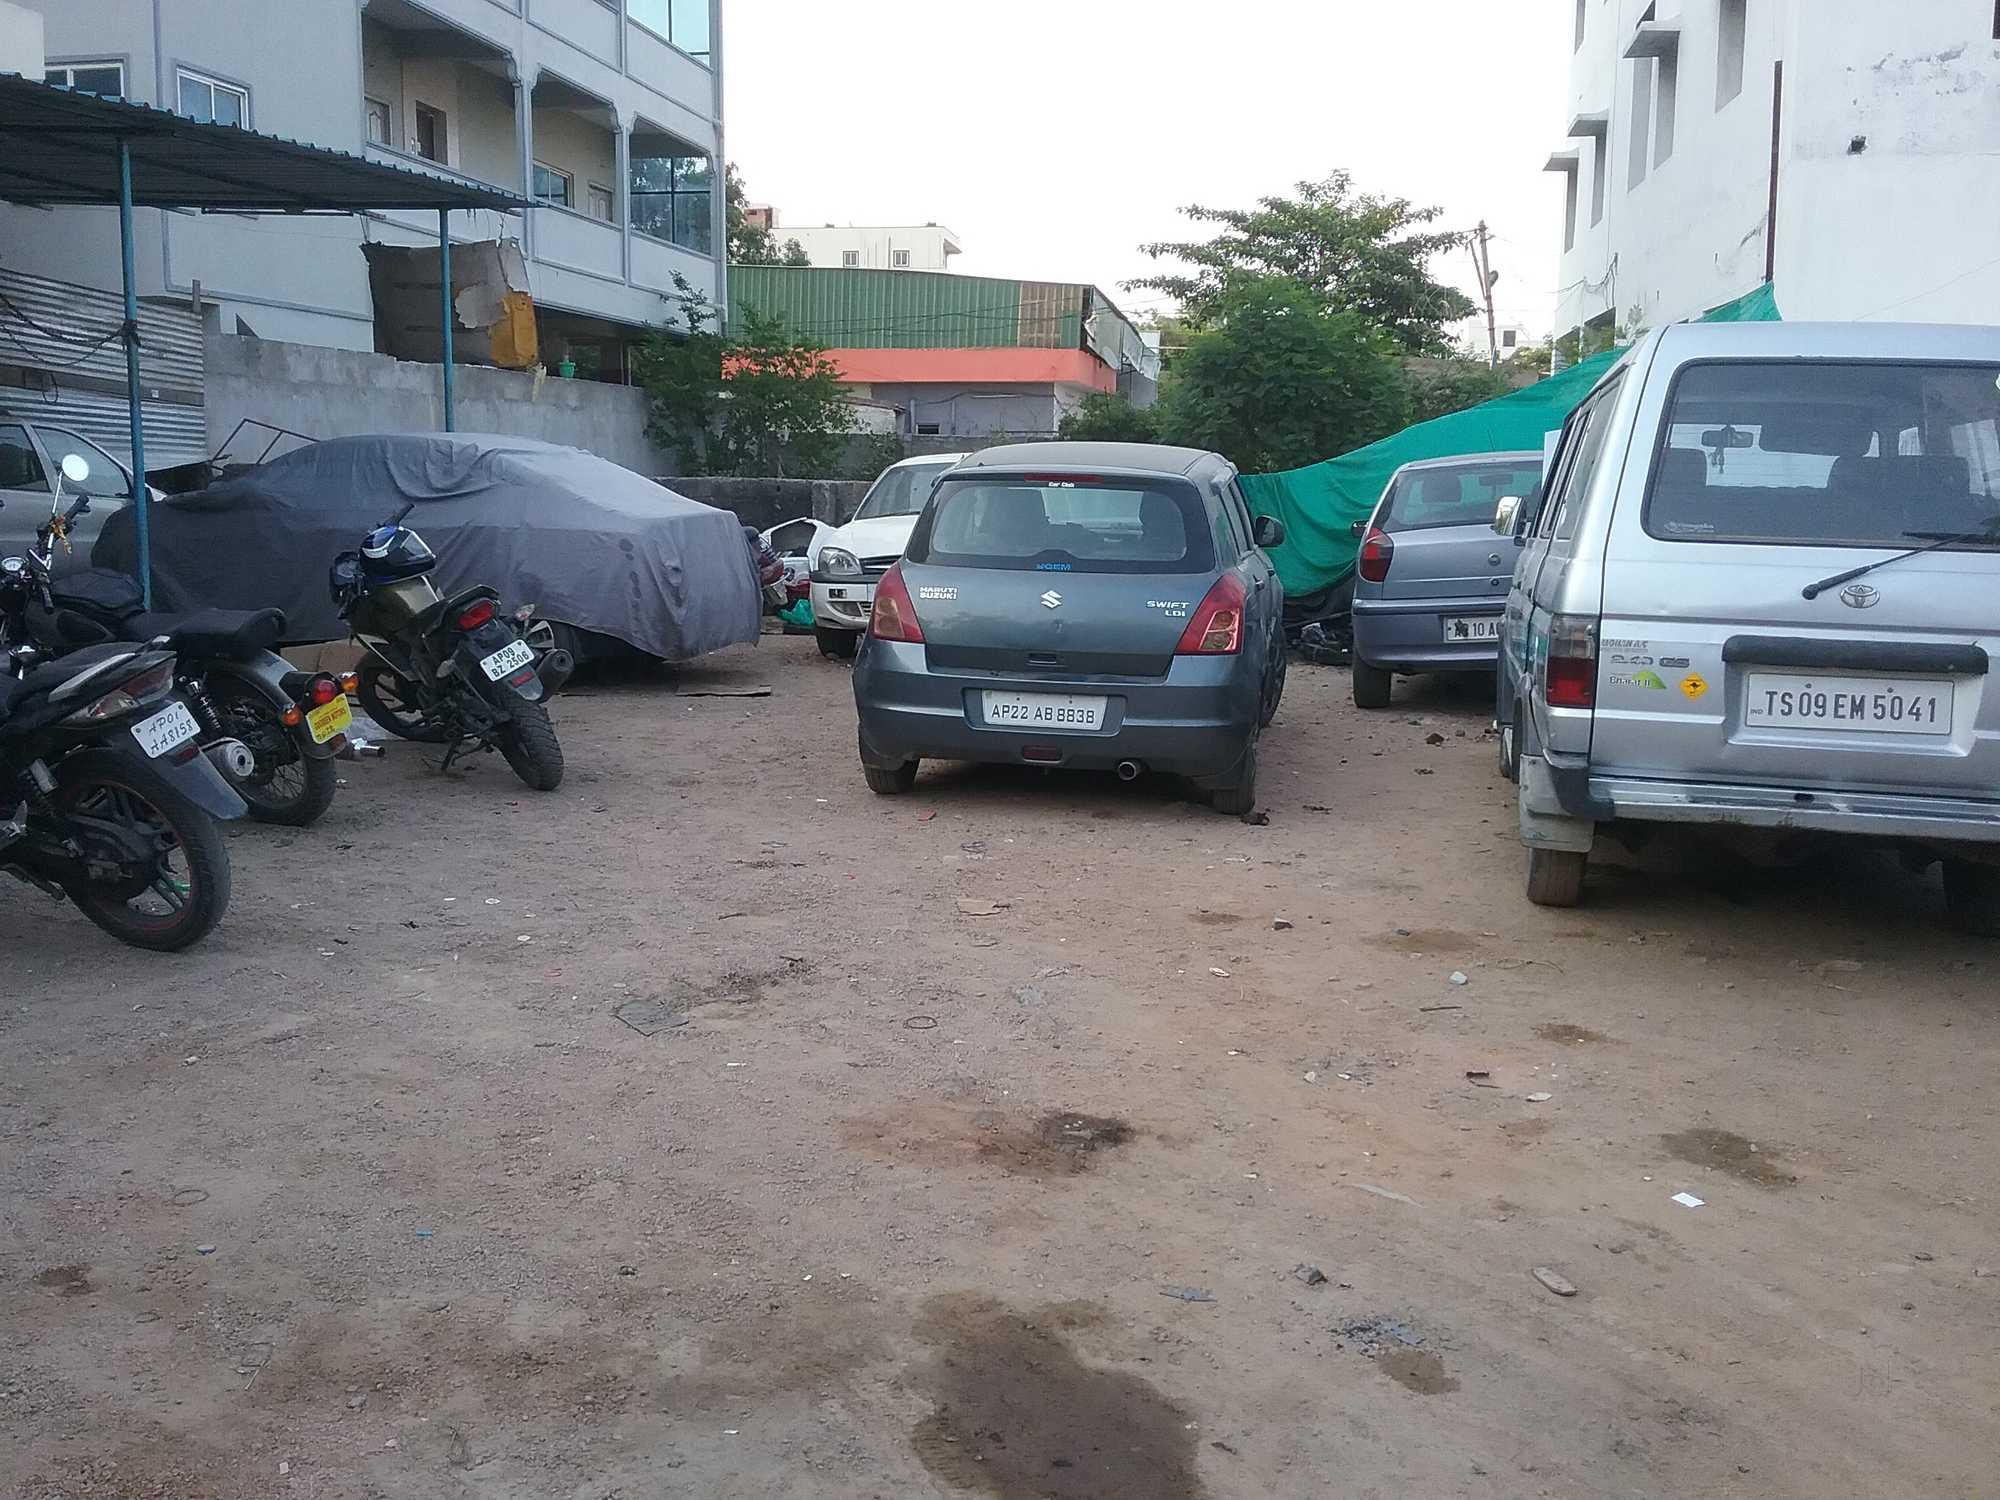 Fiat Car Repair Services Hyderabad Justdial